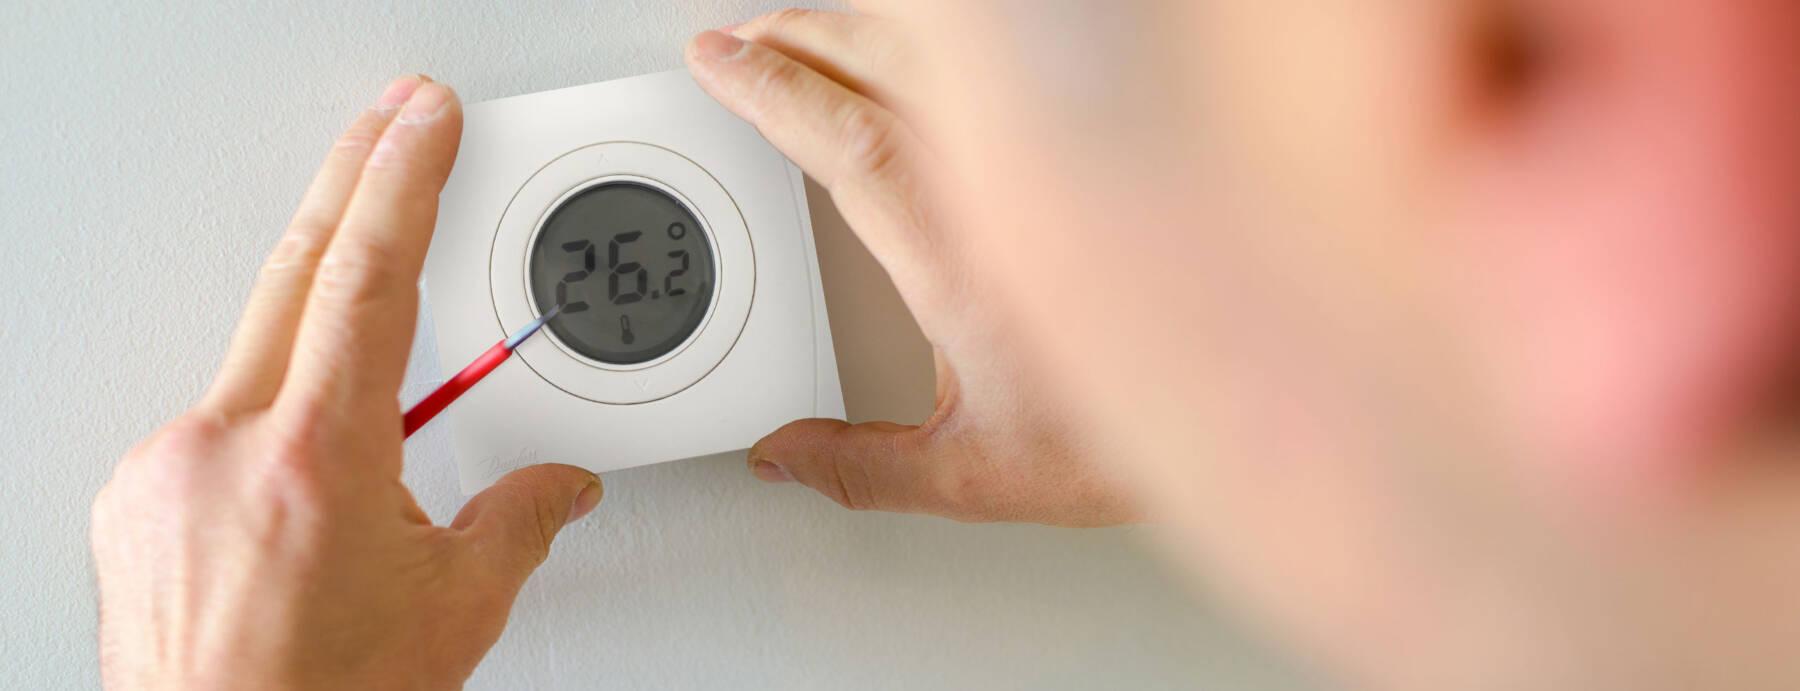 man installing the genius home thermostats SMART hub